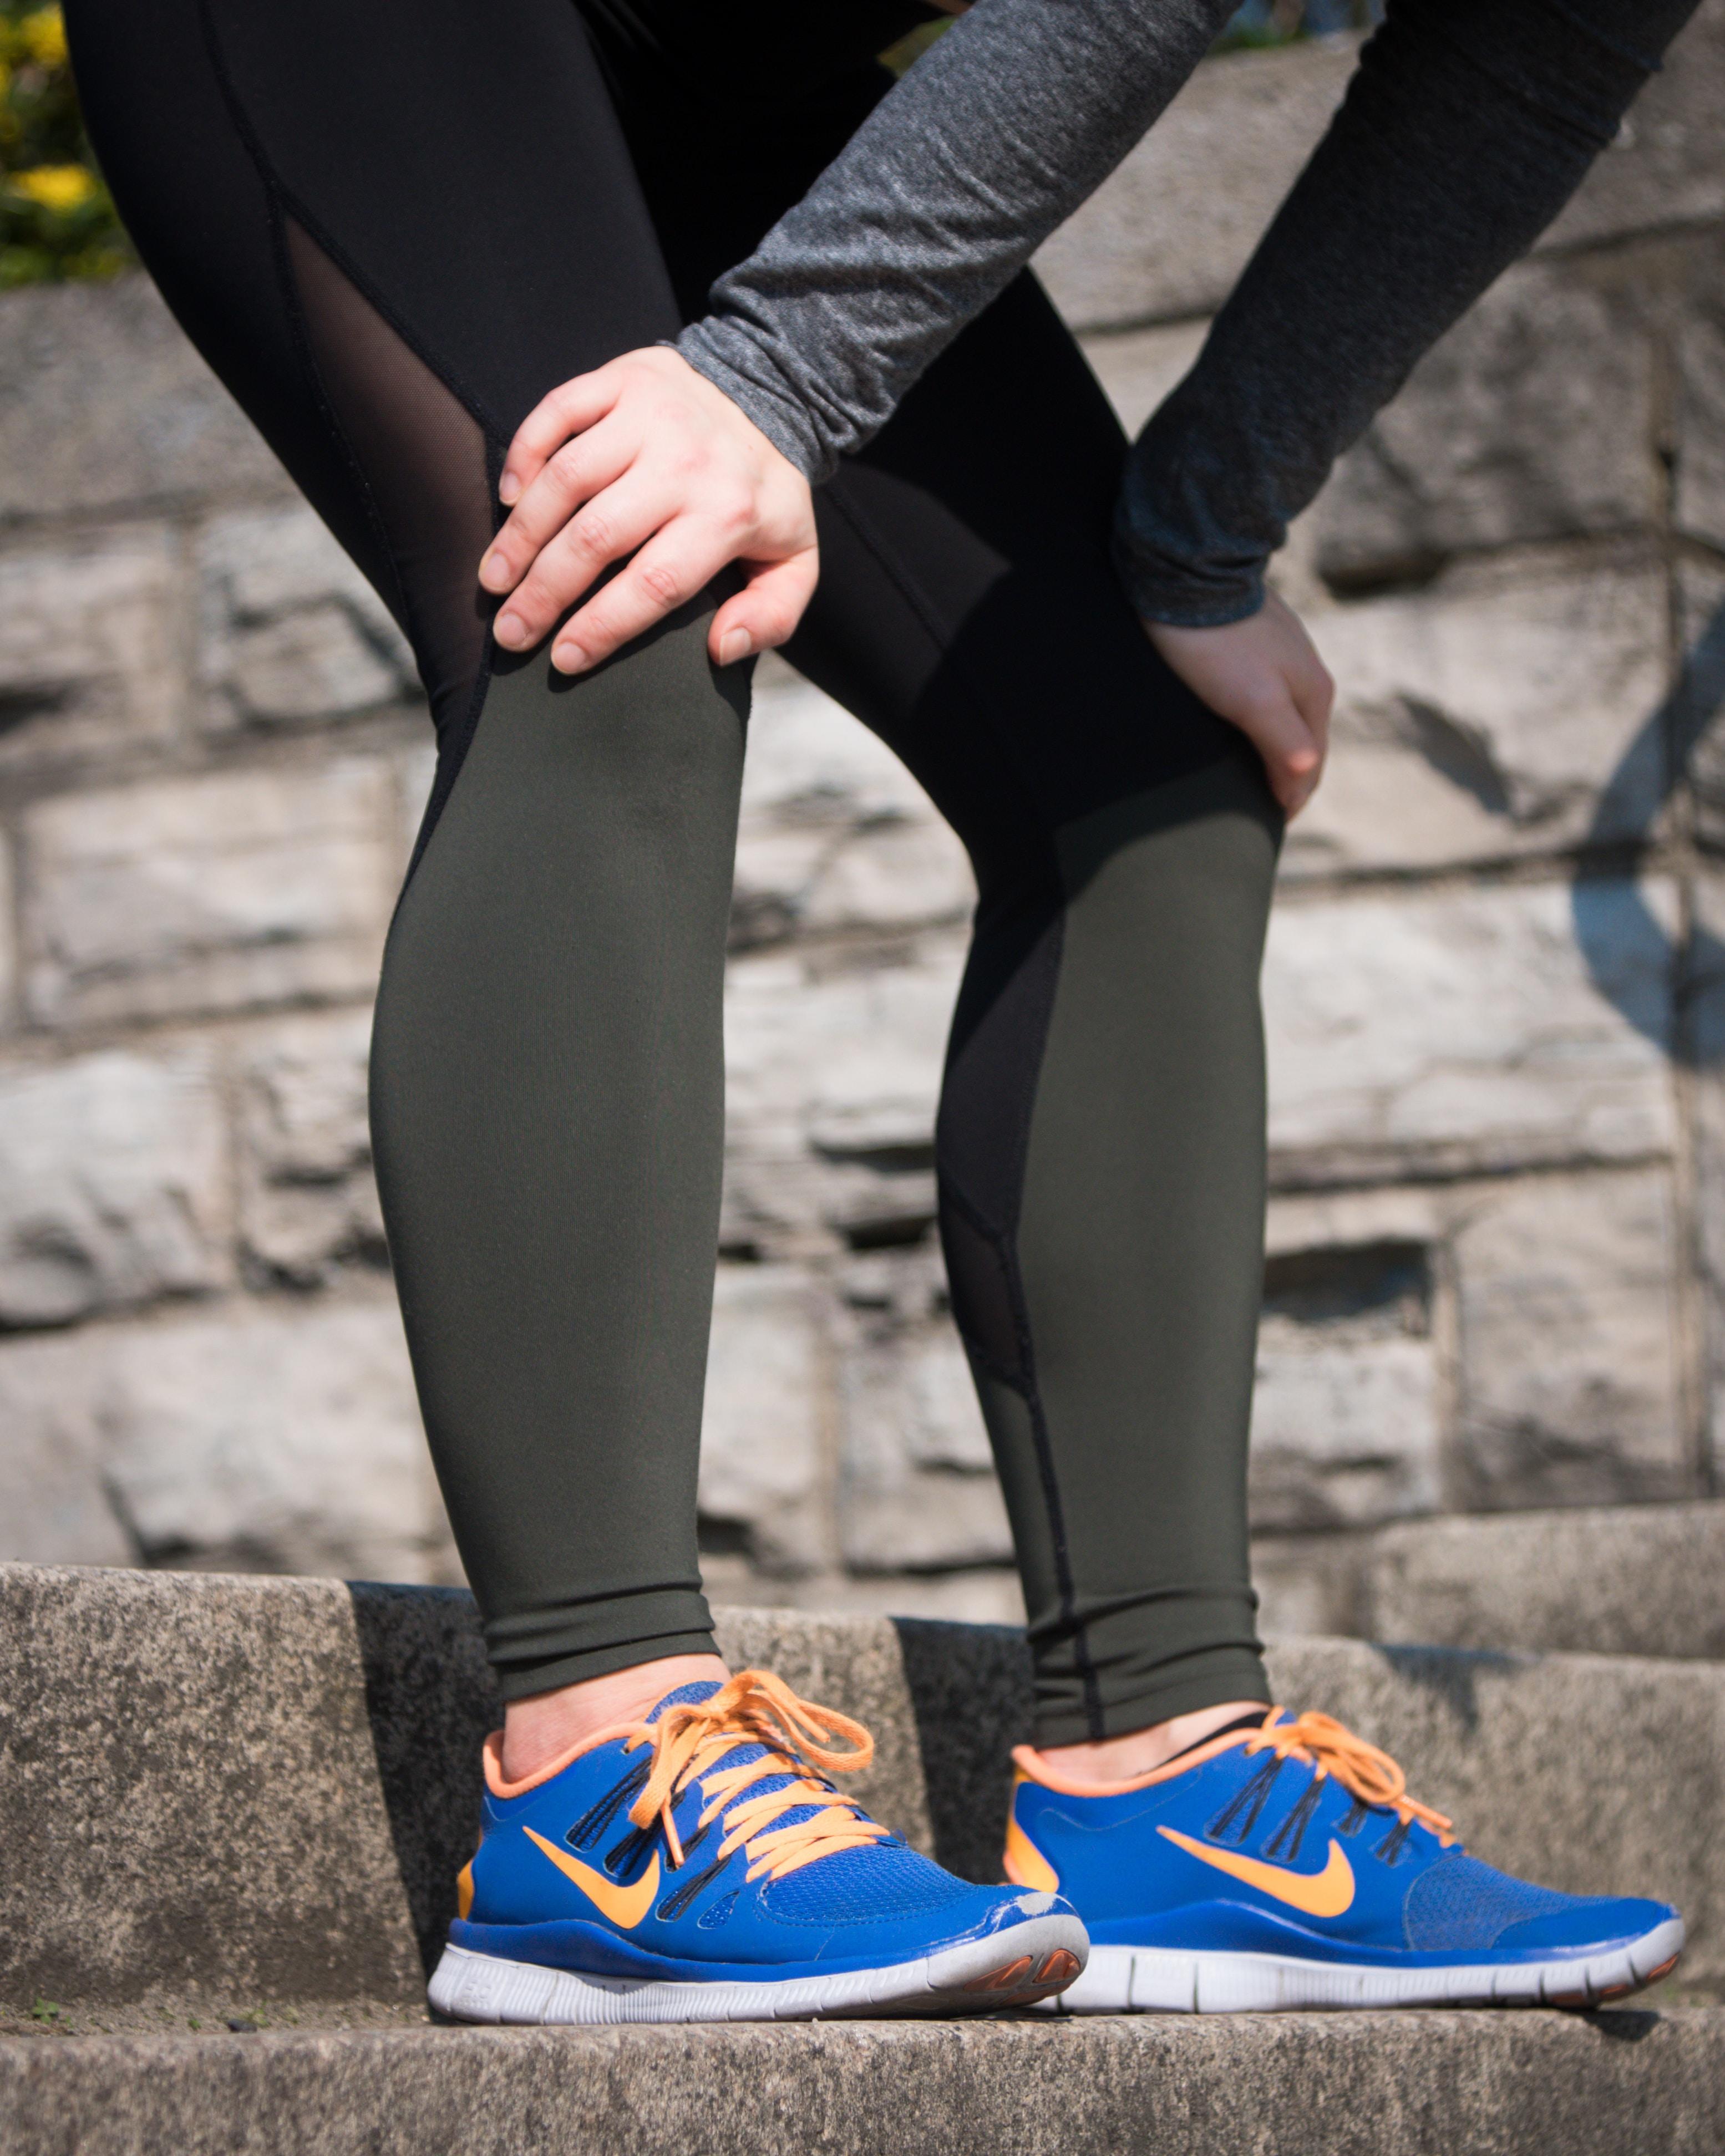 orange-and-blue Nike running shoes